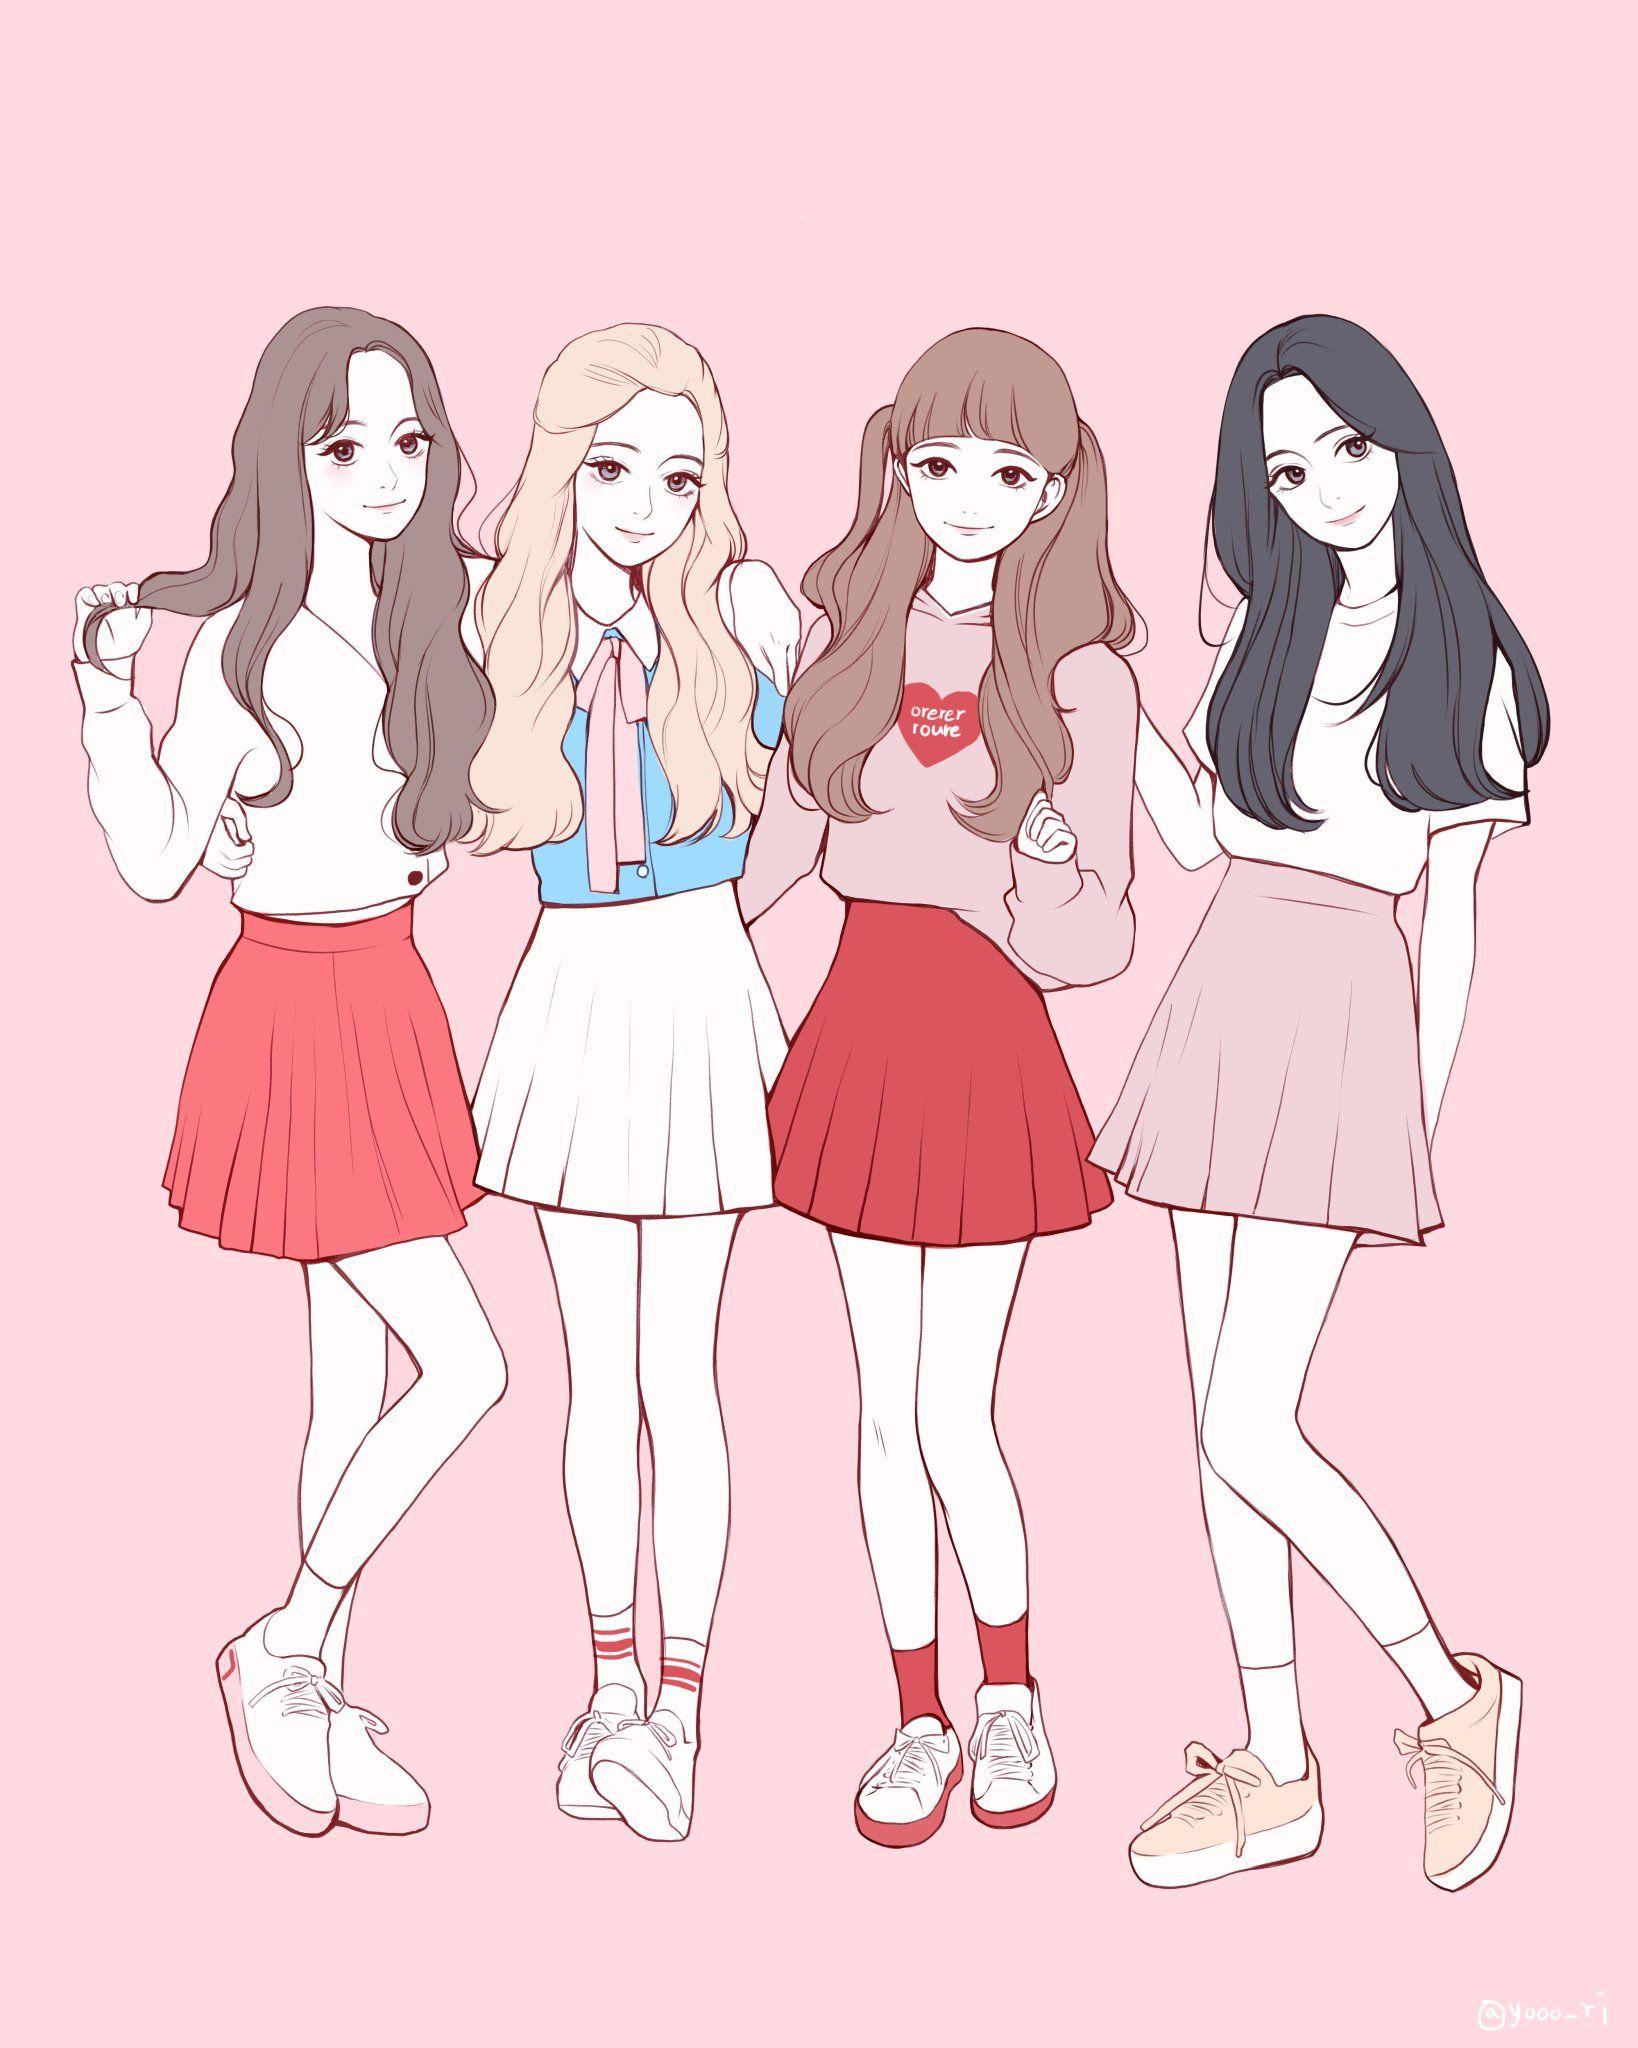 Yori On Twitter Girls Cartoon Art Friend Anime Anime Best Friends